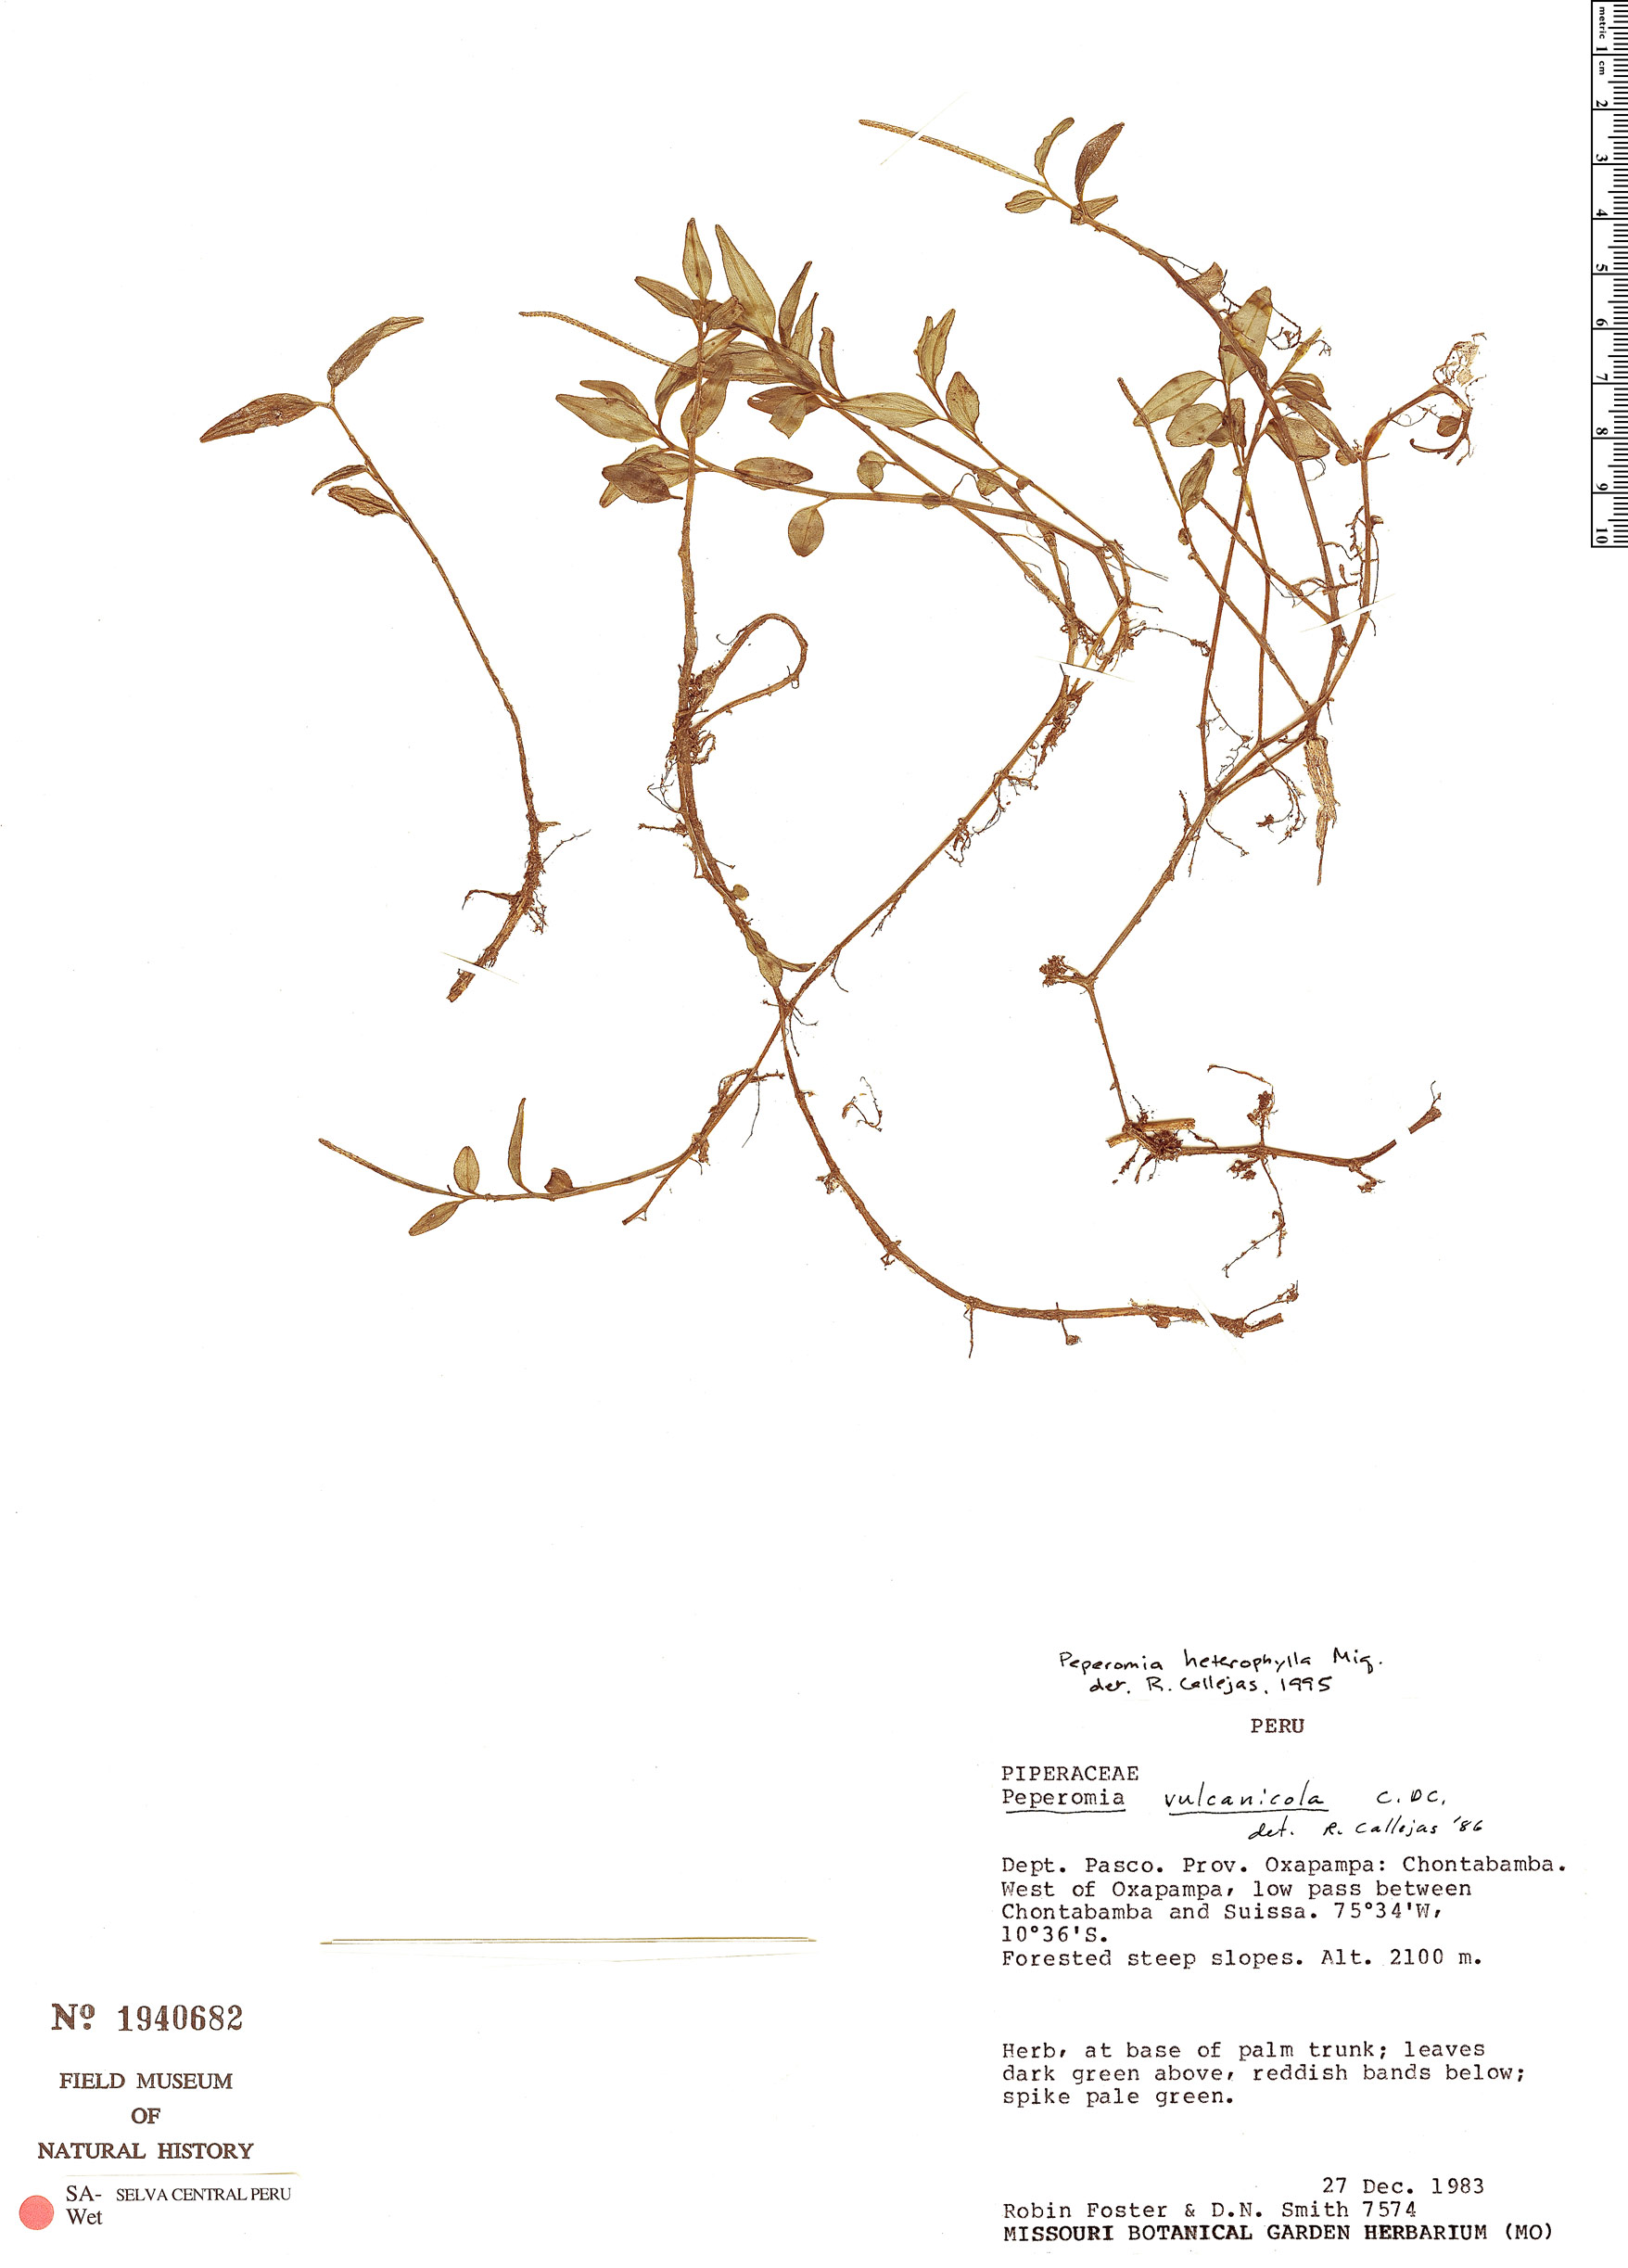 Specimen: Peperomia heterophylla